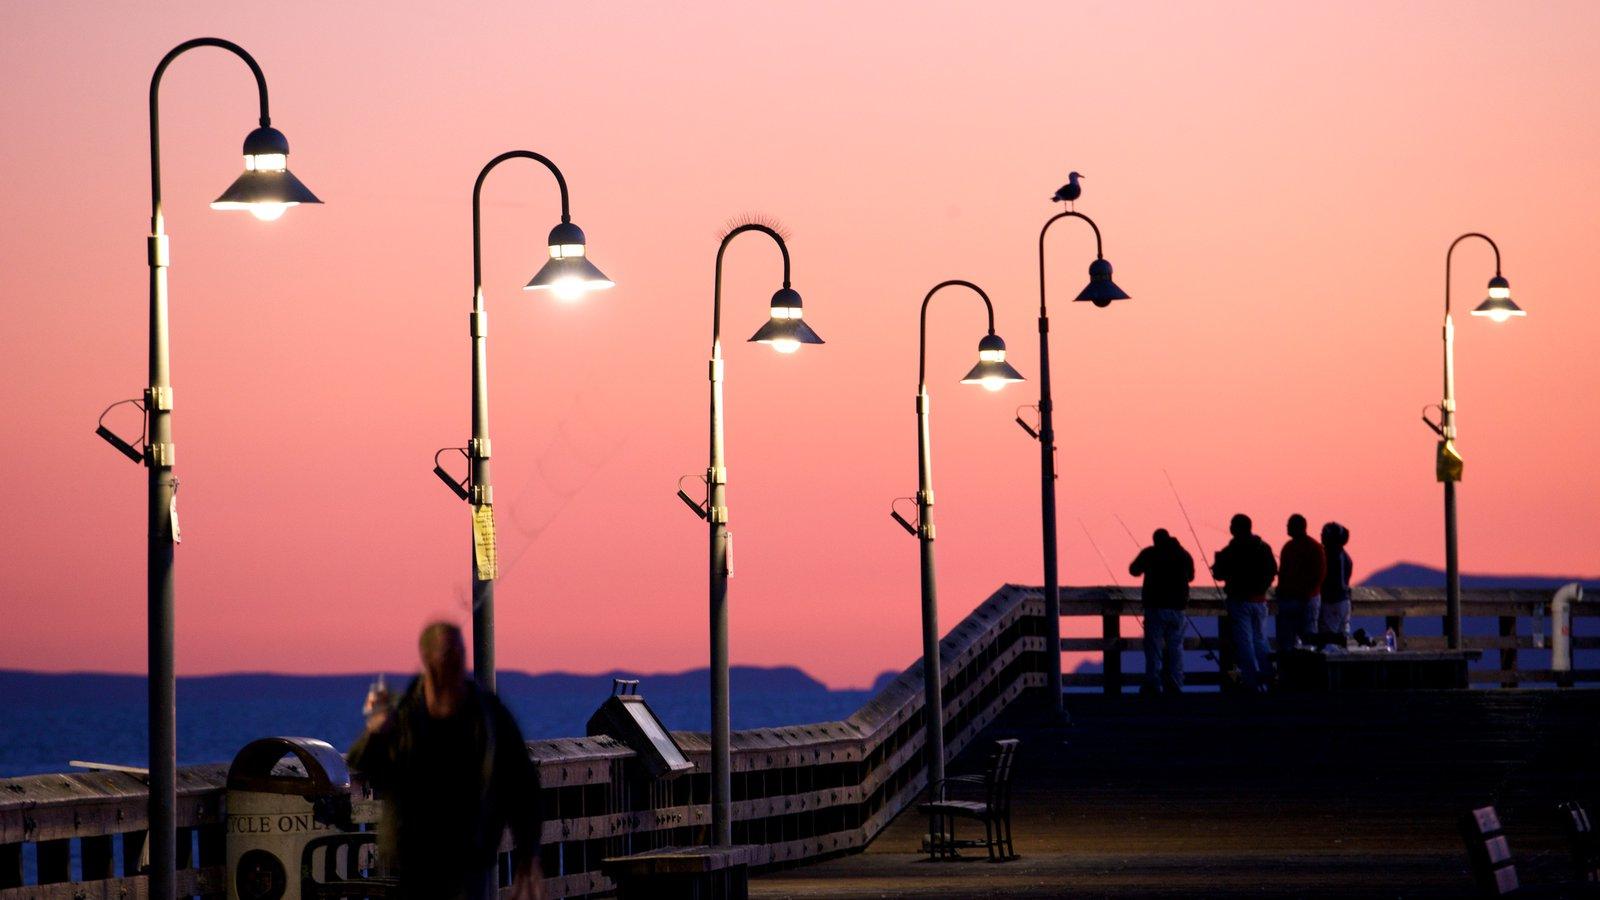 Muelle de Ventura